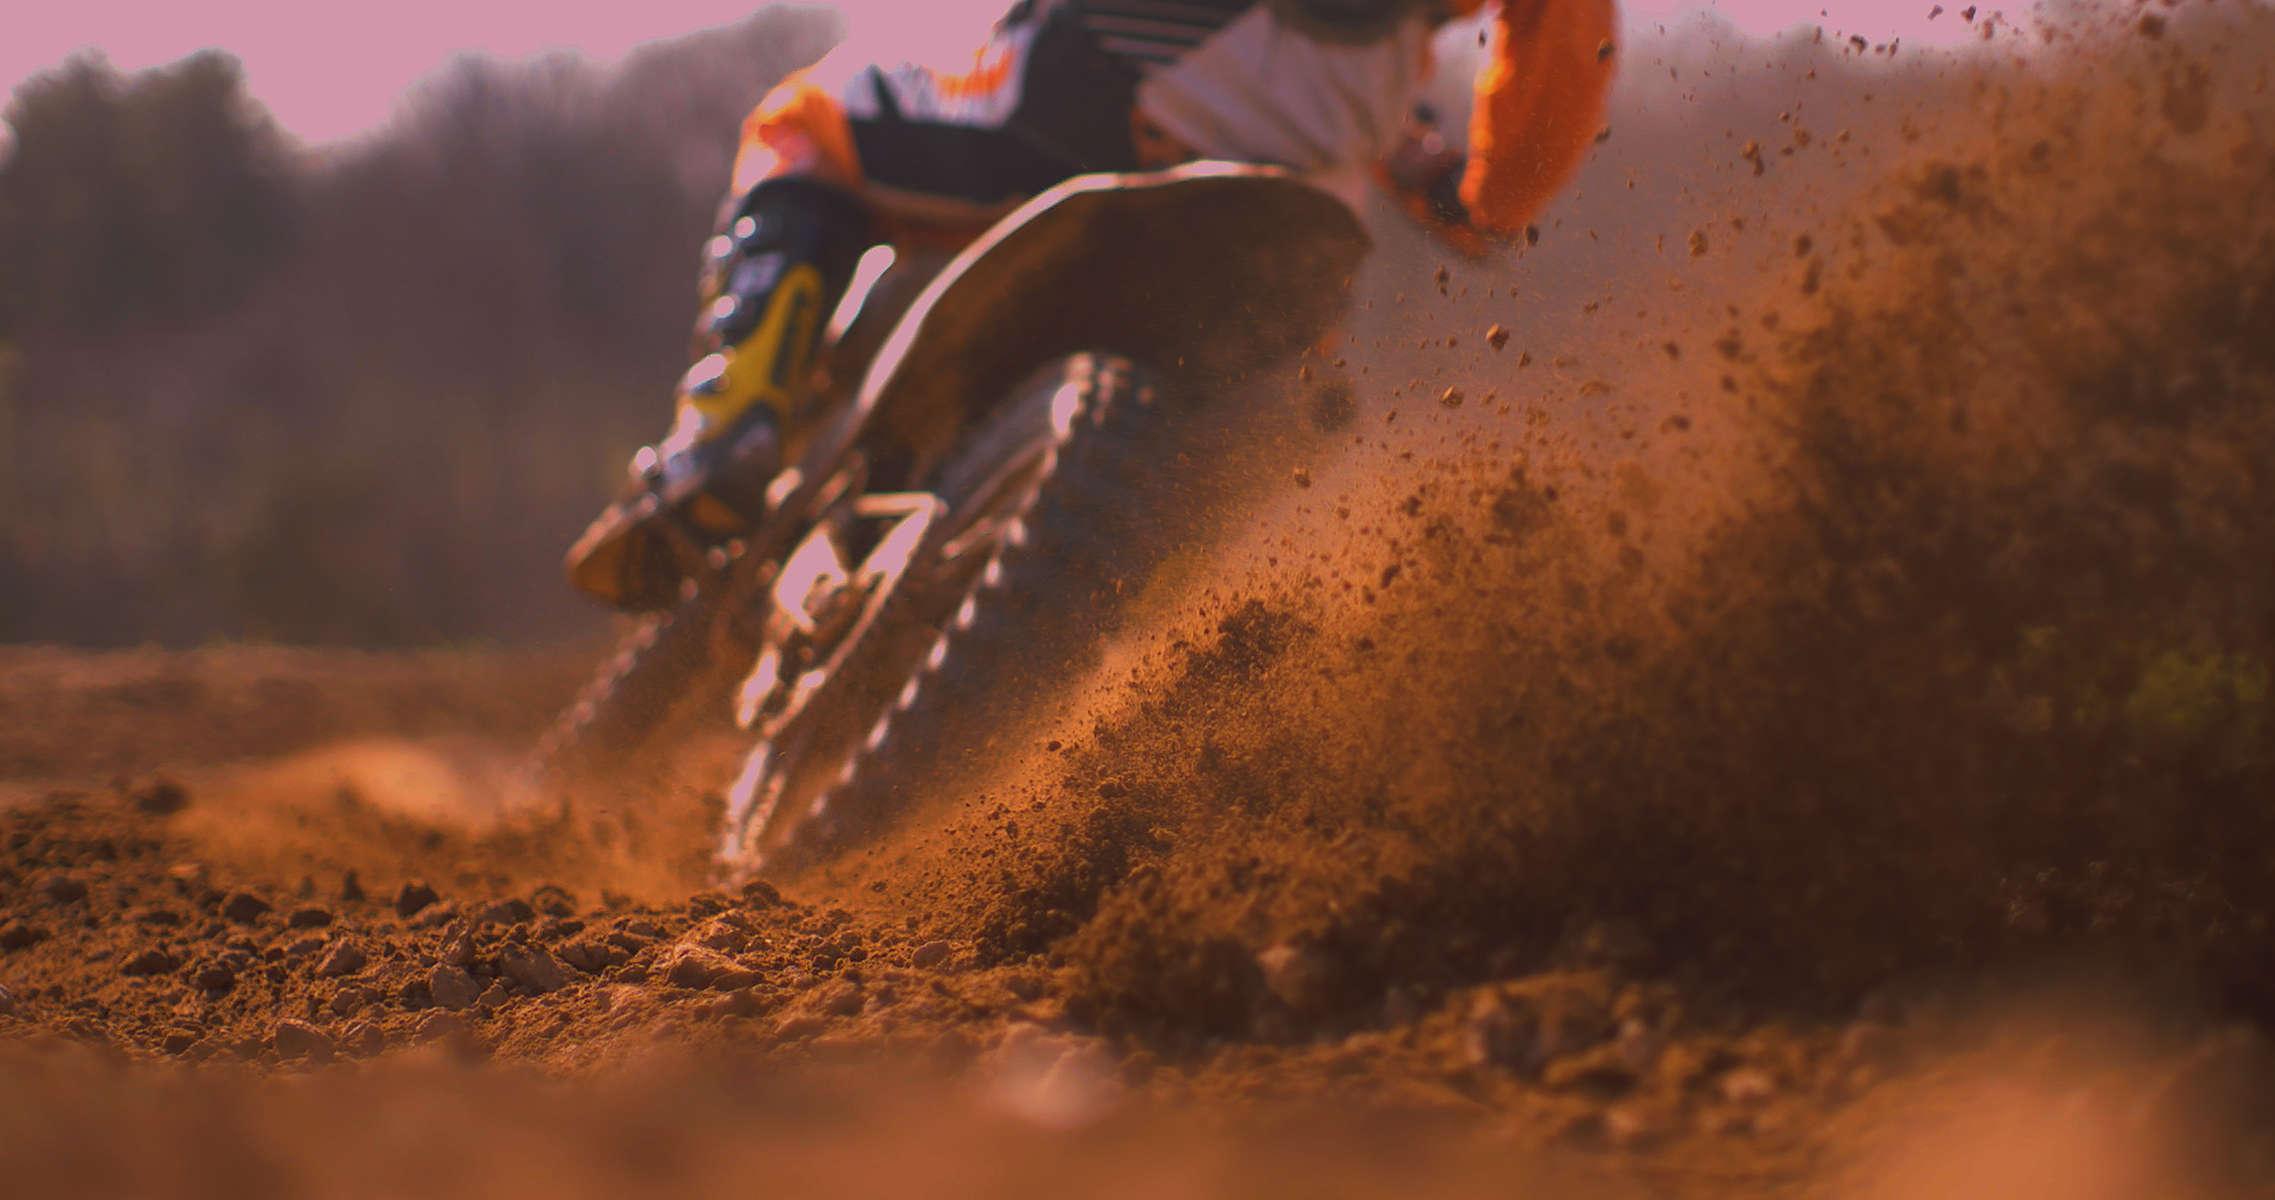 sam-dean-virginia-photographer-director-motocross